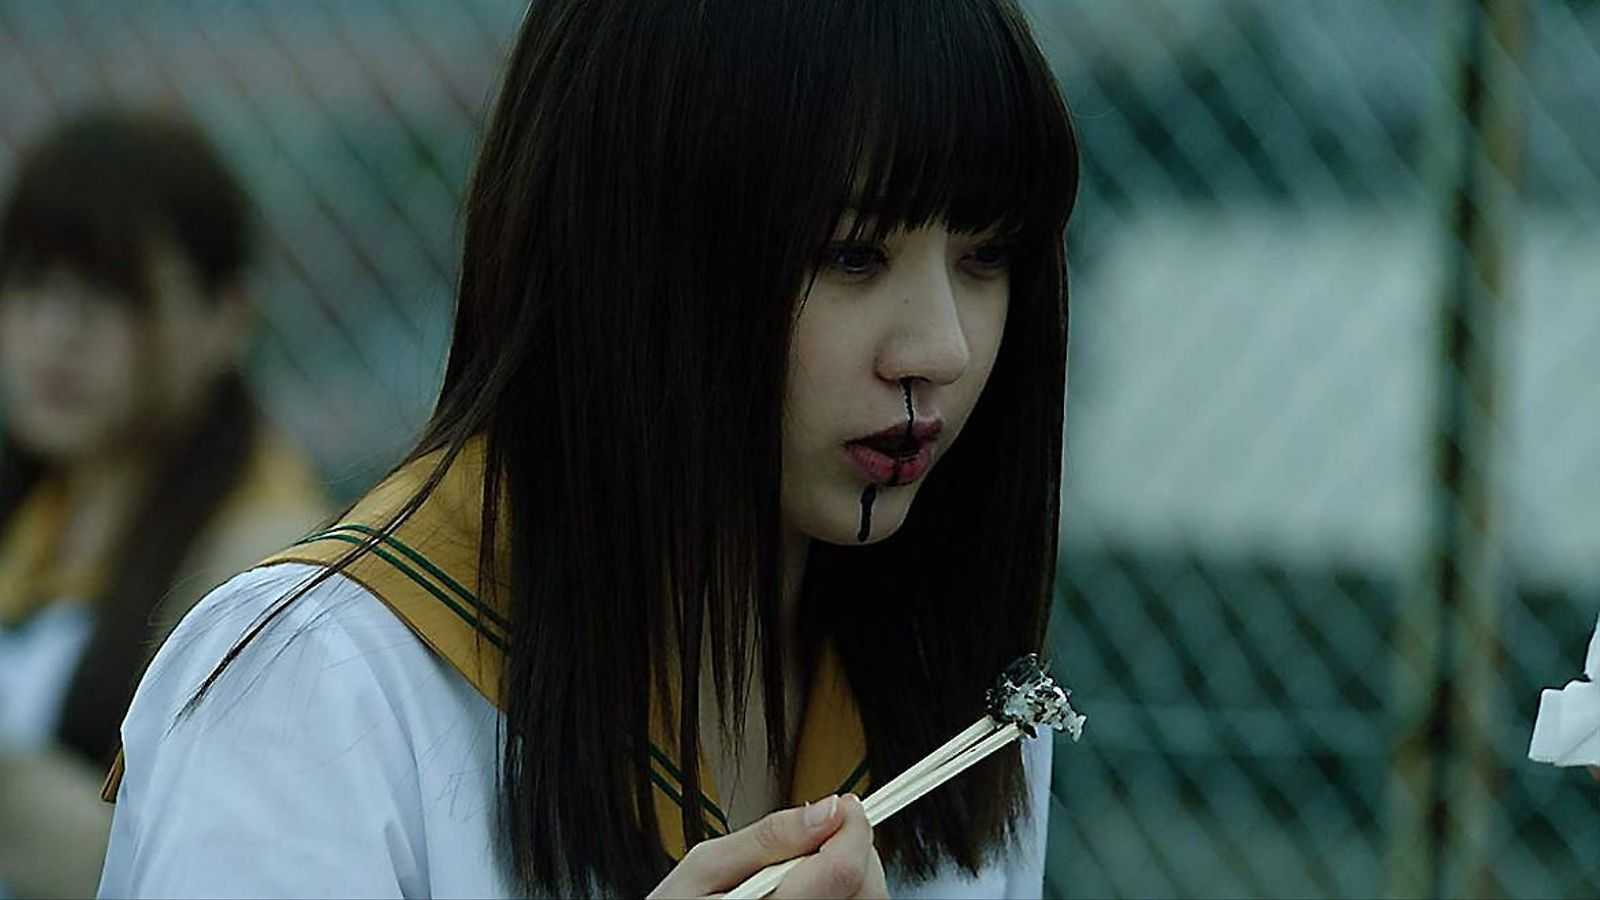 Dark estrena la minisèrie de terror japonès 'Crow's blood'